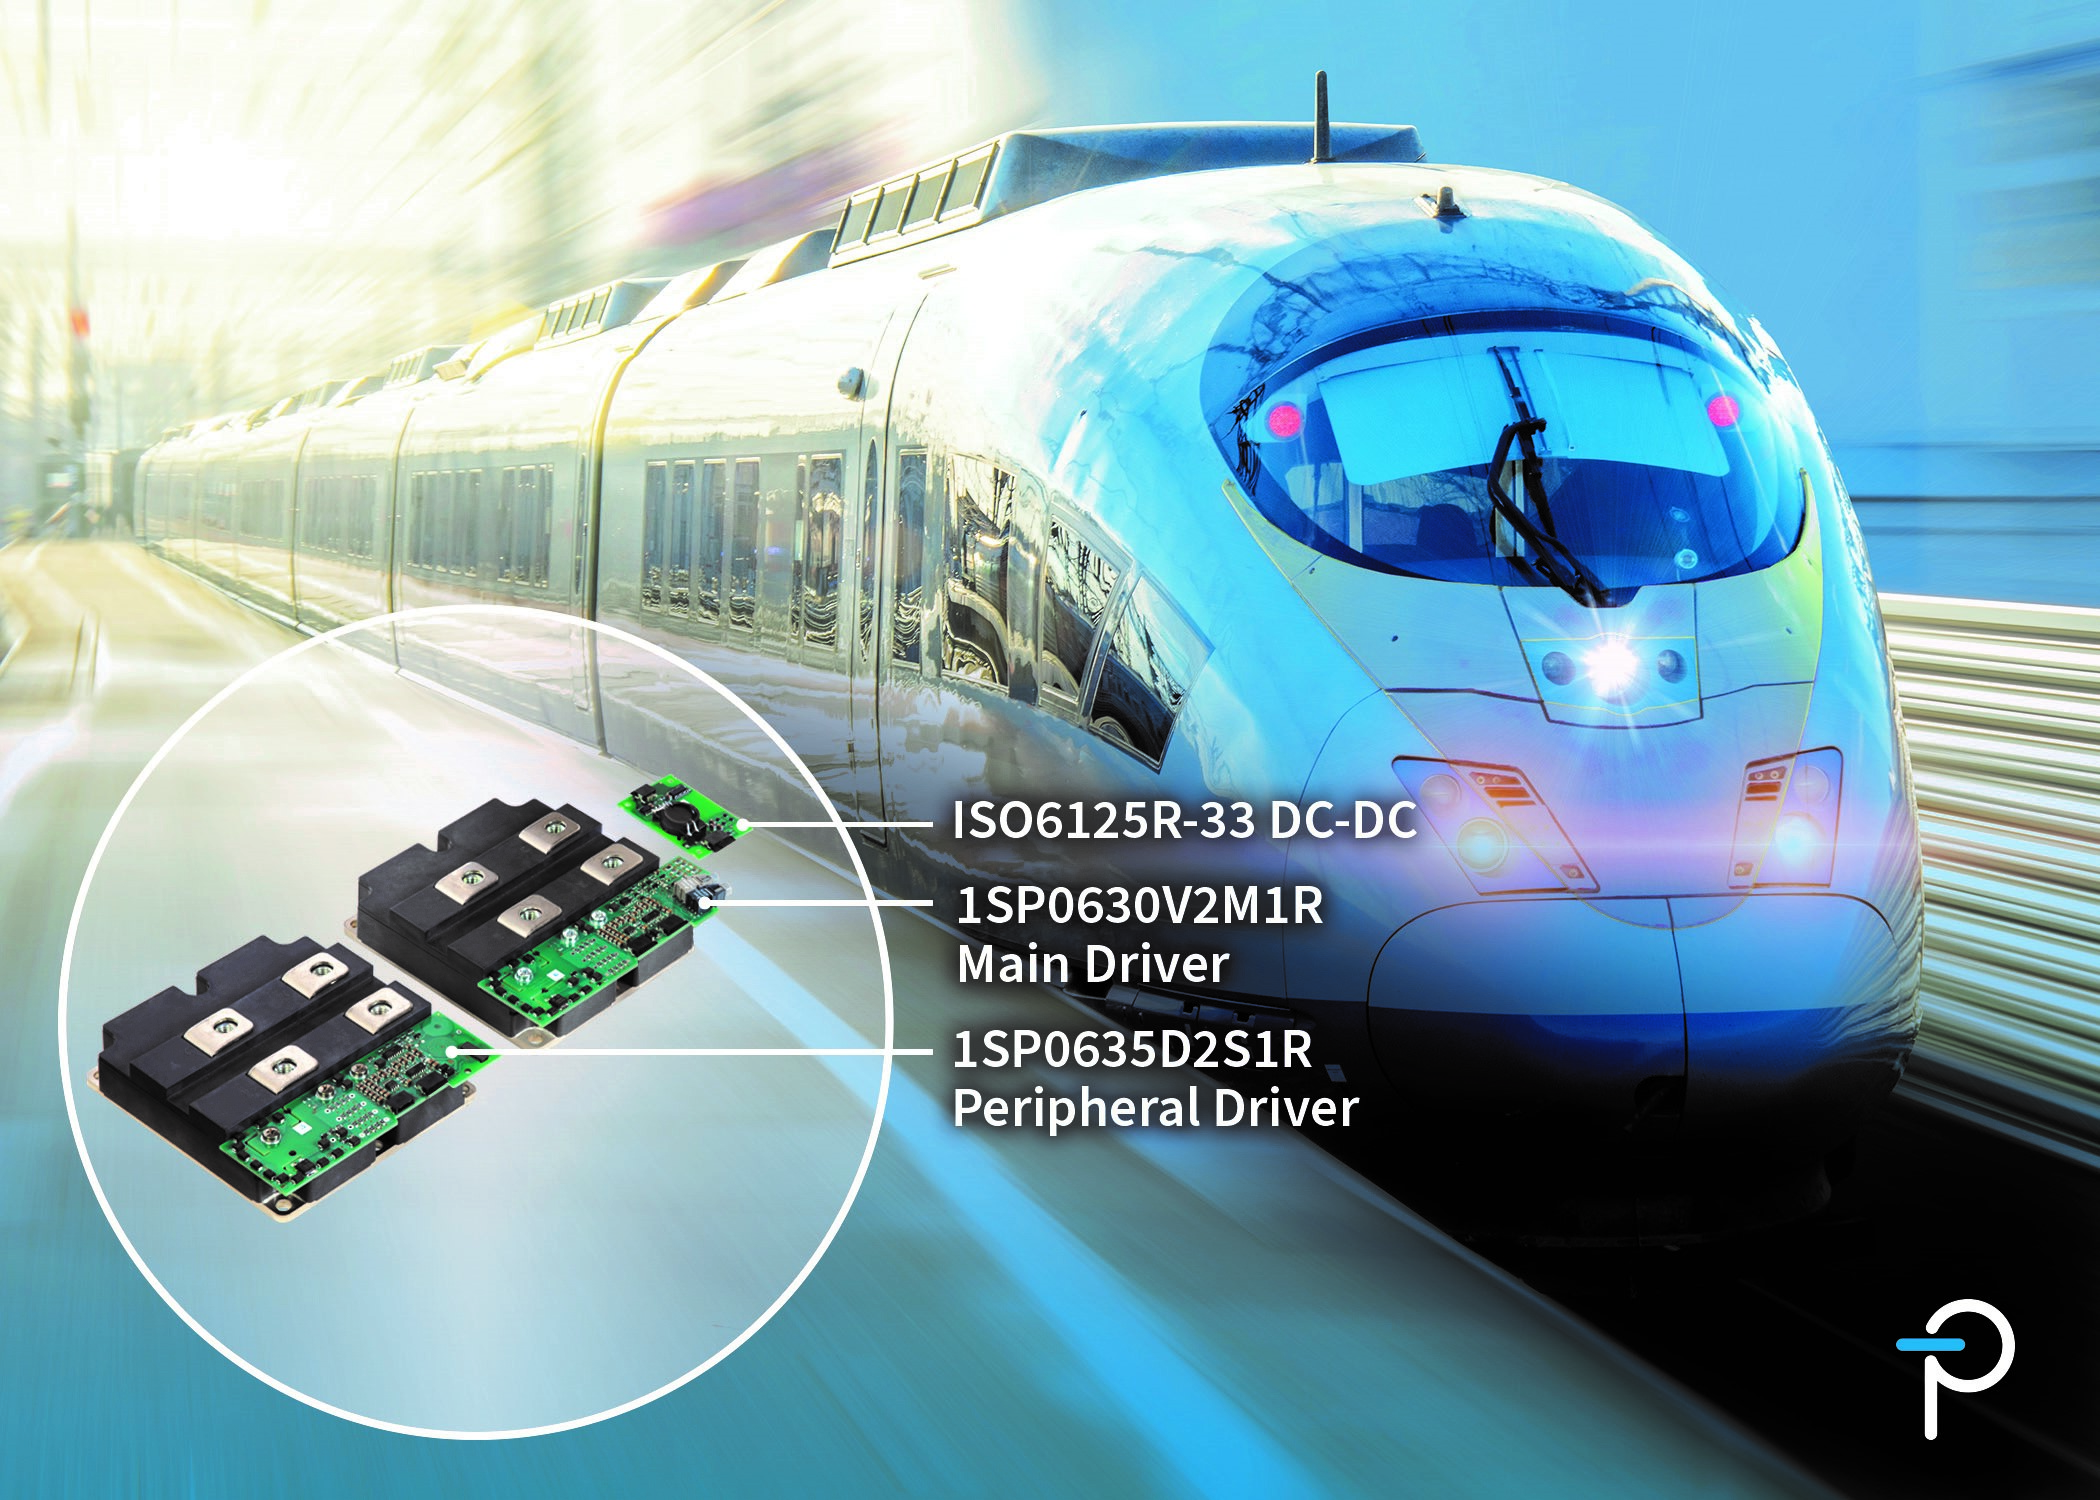 Power Integrations面向軌道交通應用推出新款外形緊湊、堅固耐用的SCALE-2即插即用型門極驅動器